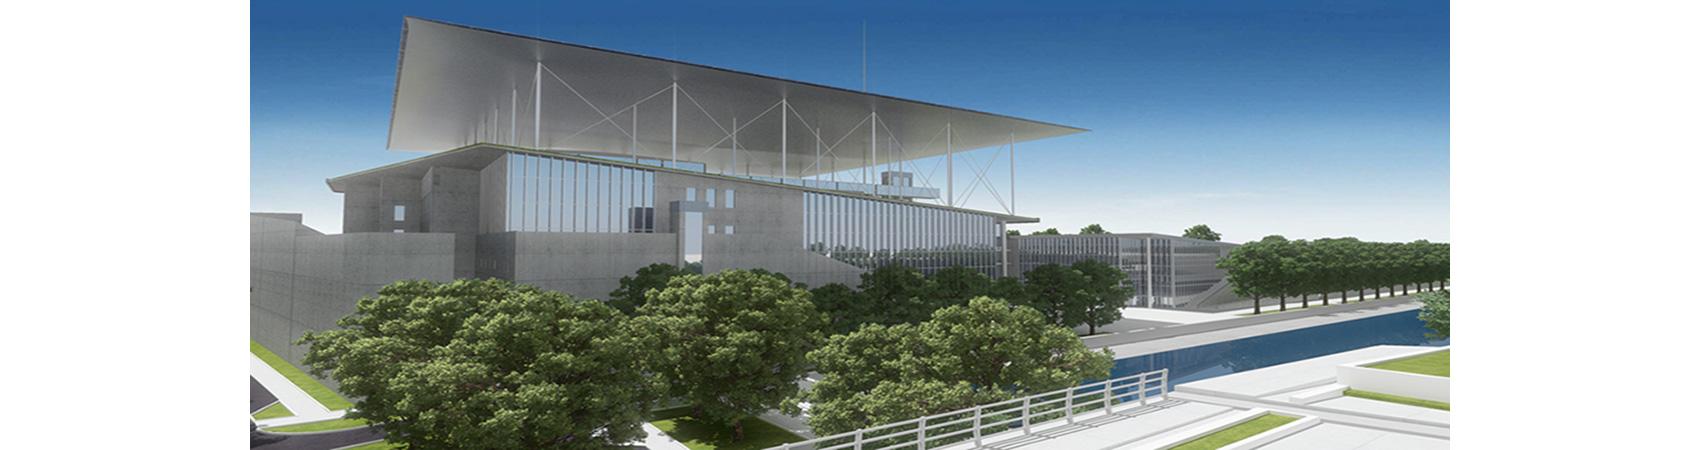 stavros-niarchos-foundation-cultural-centre